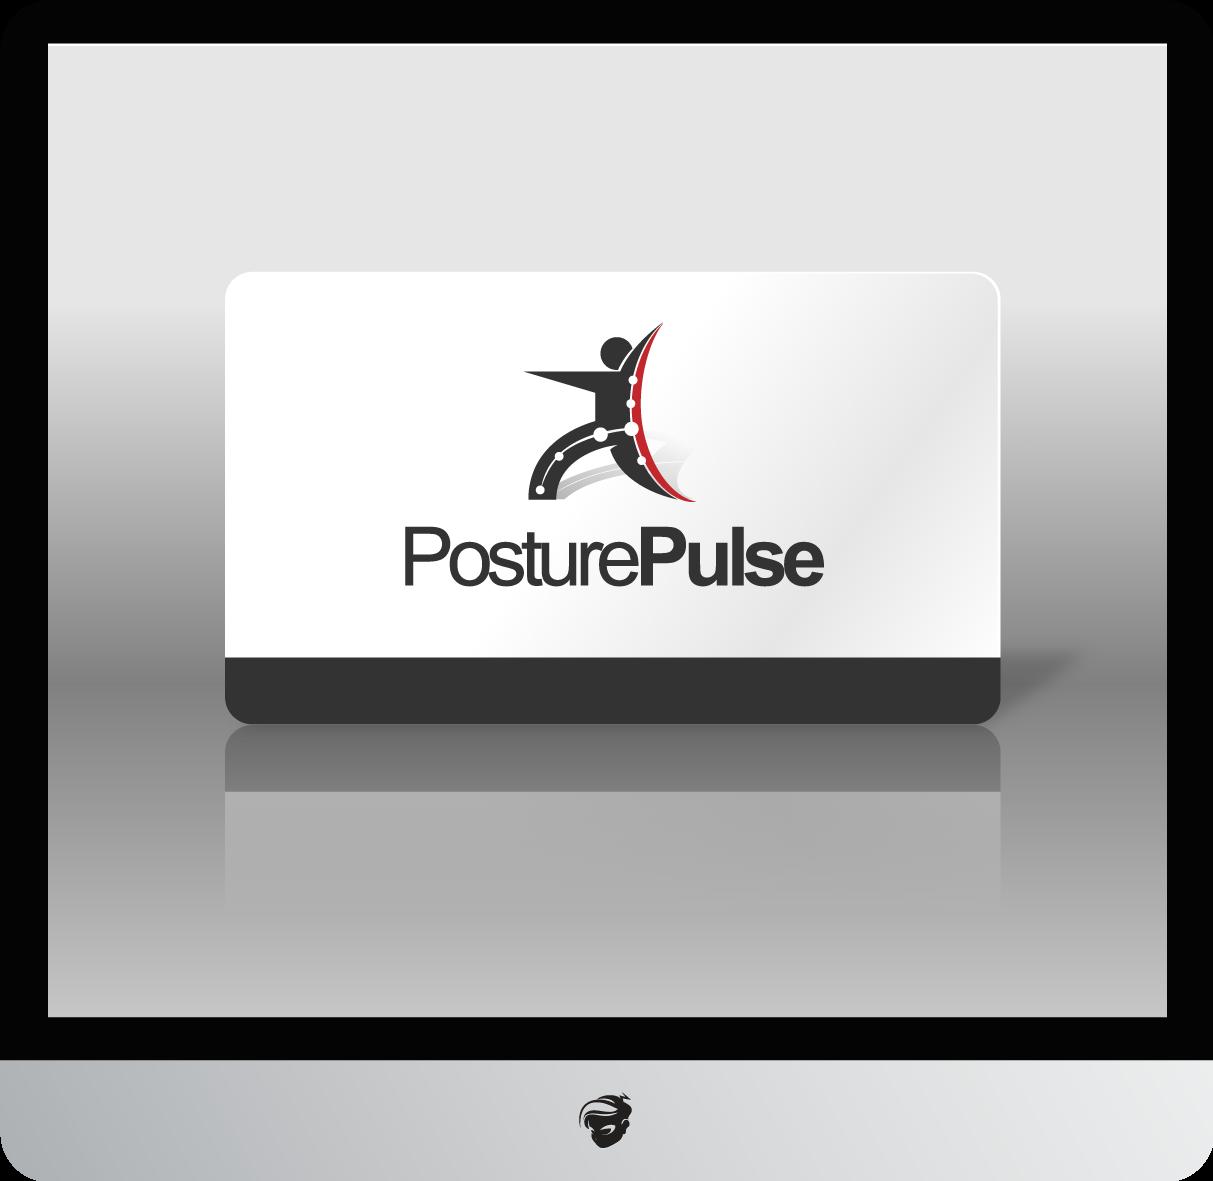 Logo Design by zesthar - Entry No. 52 in the Logo Design Contest Unique Logo Design Wanted for PosturePulse.